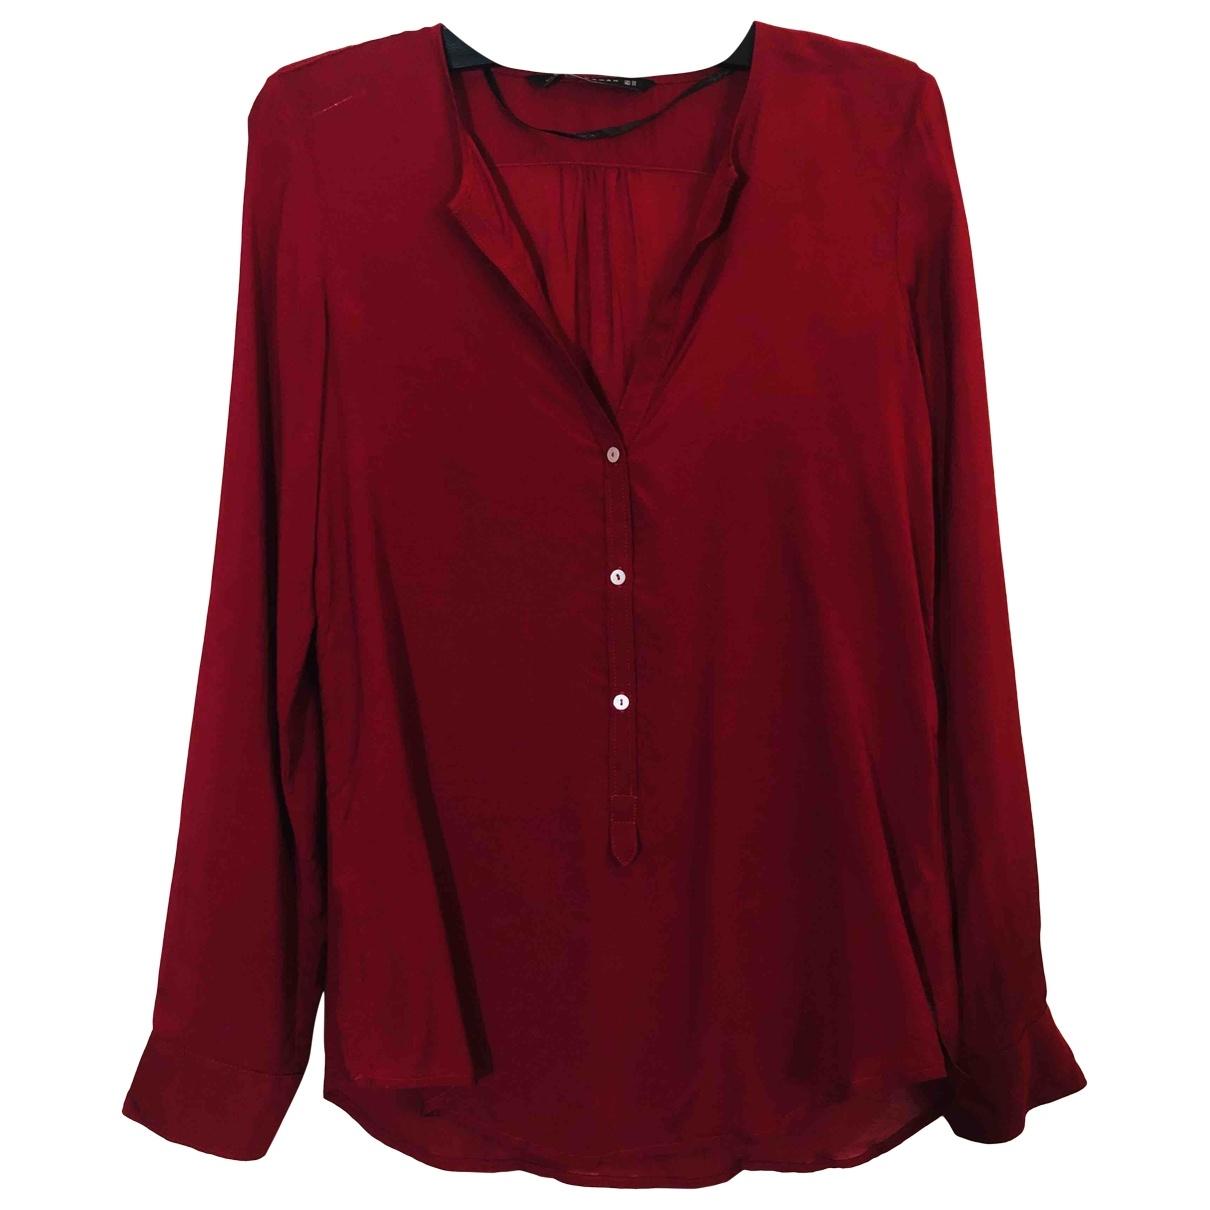 Zara \N Burgundy Cotton  top for Women XS International